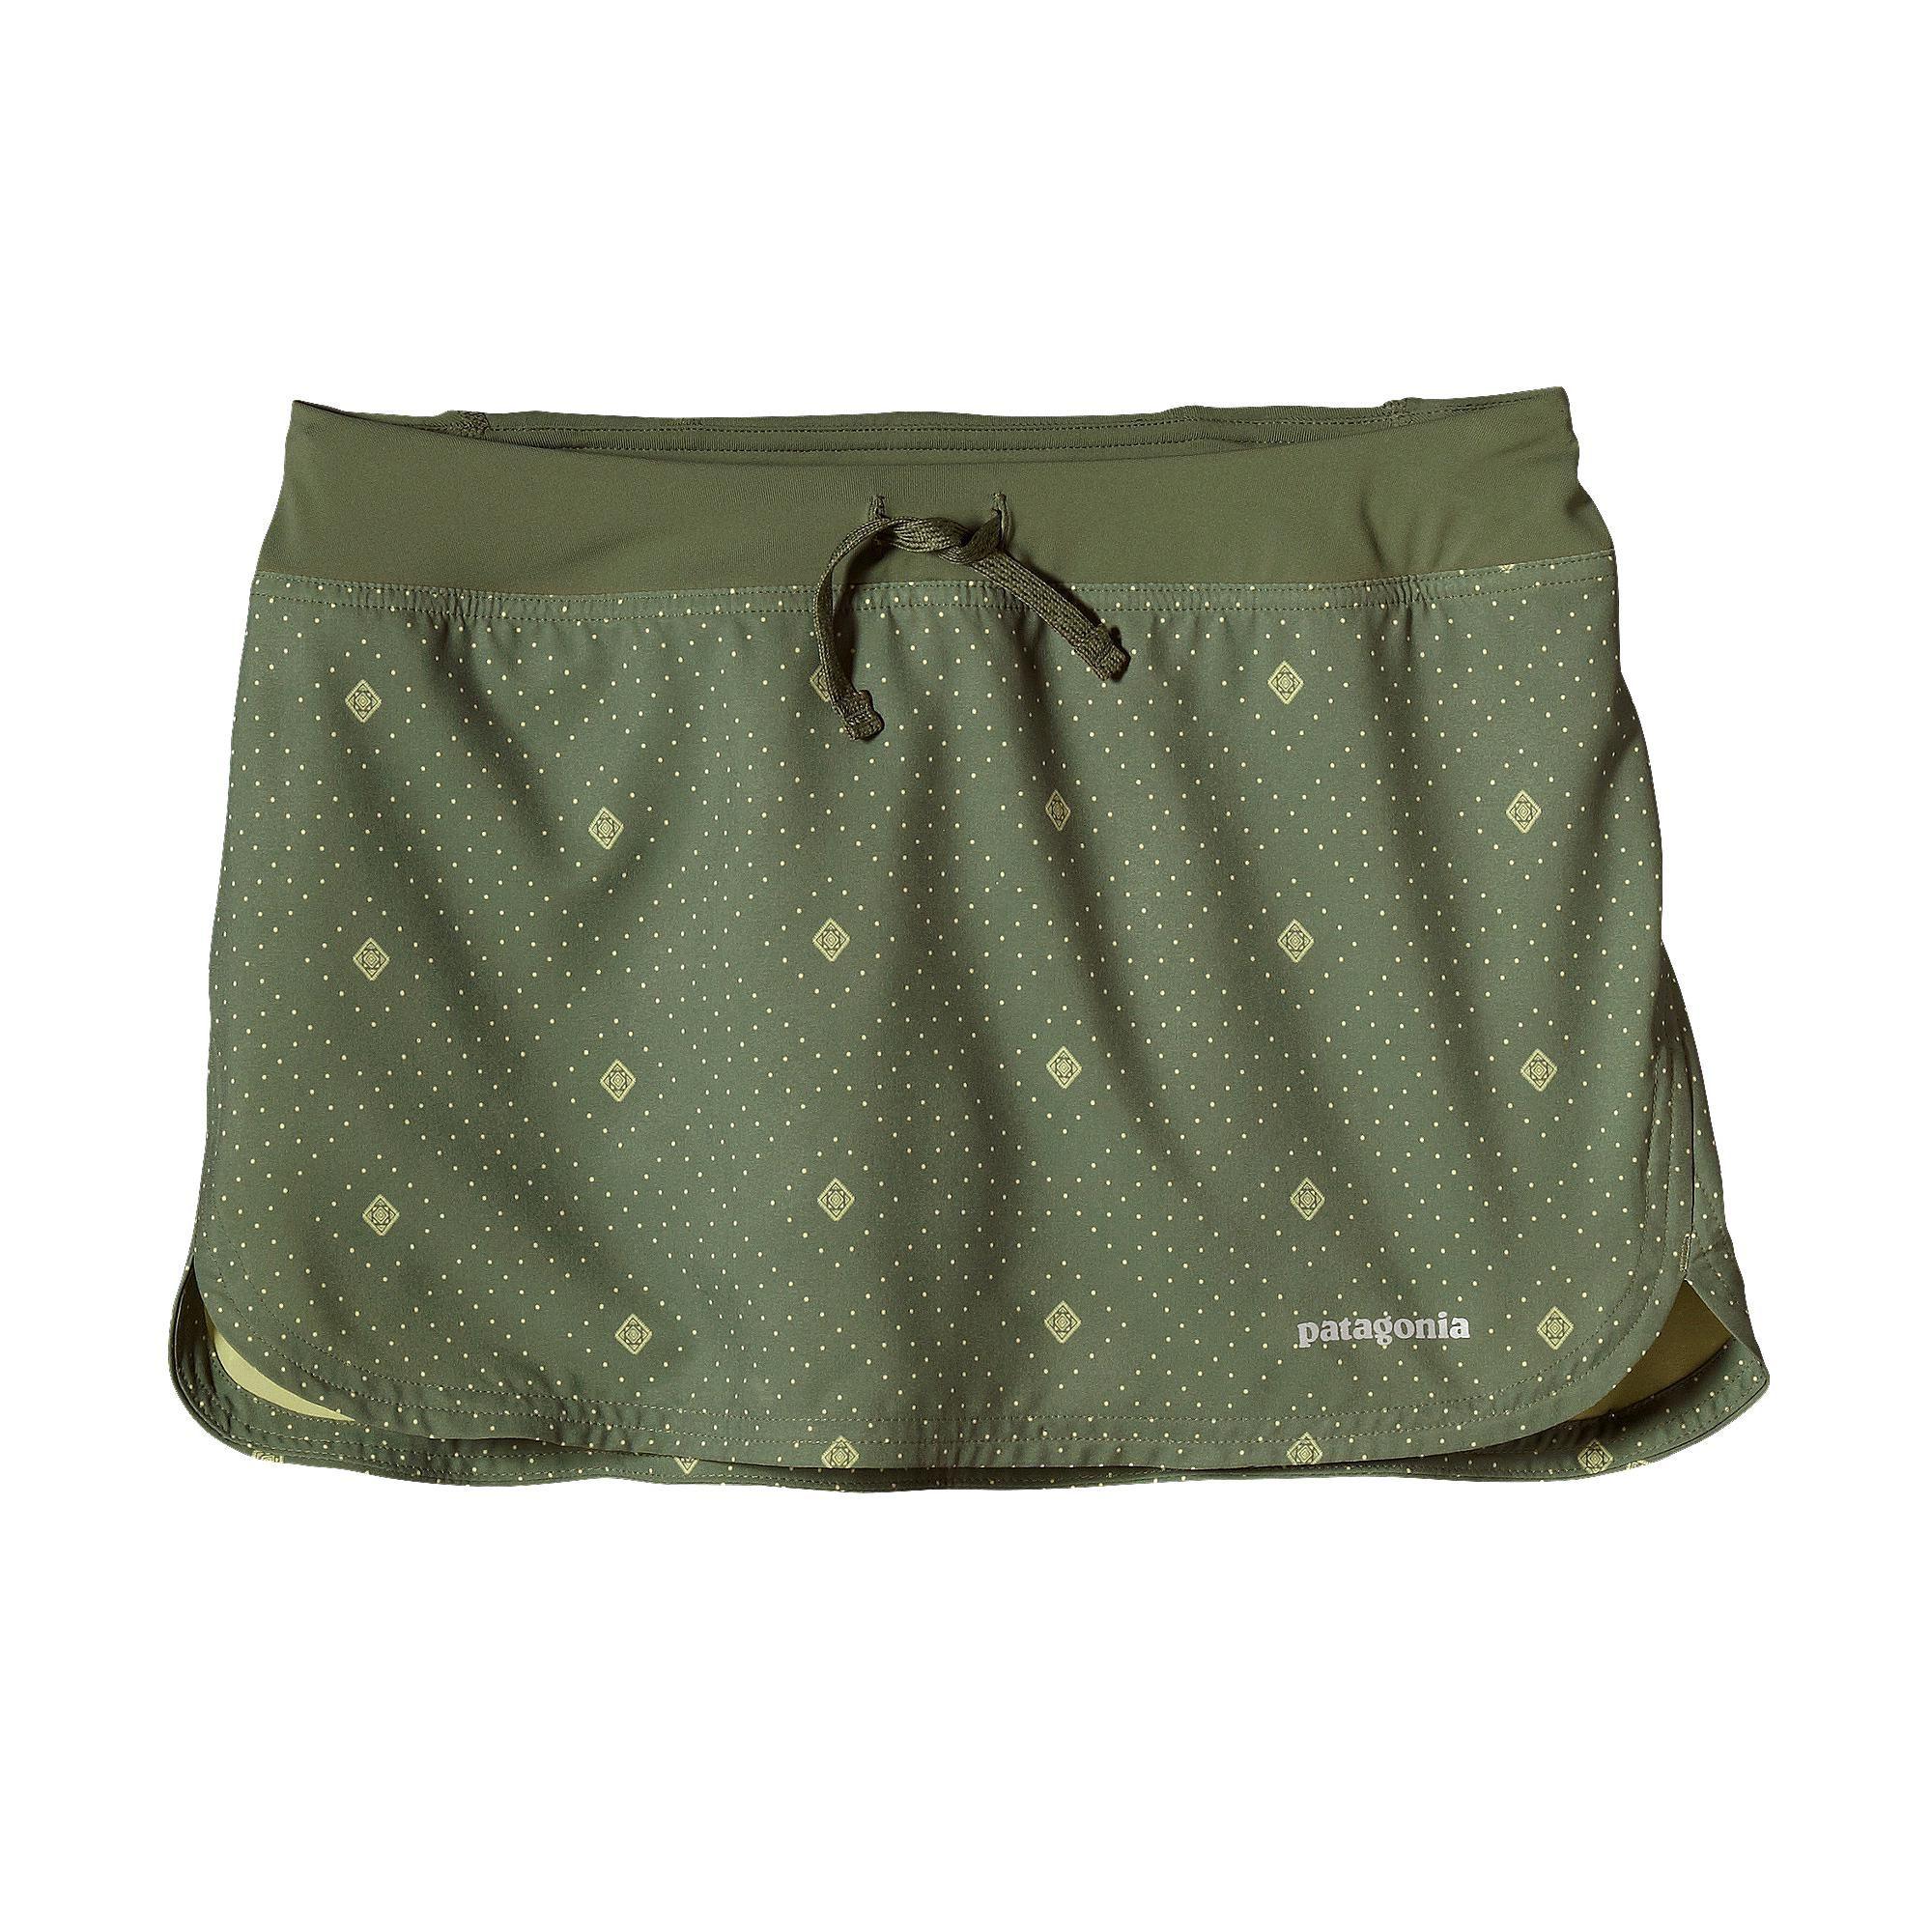 e6ce41212 The Patagonia Women's Nine Trails Skirt (11